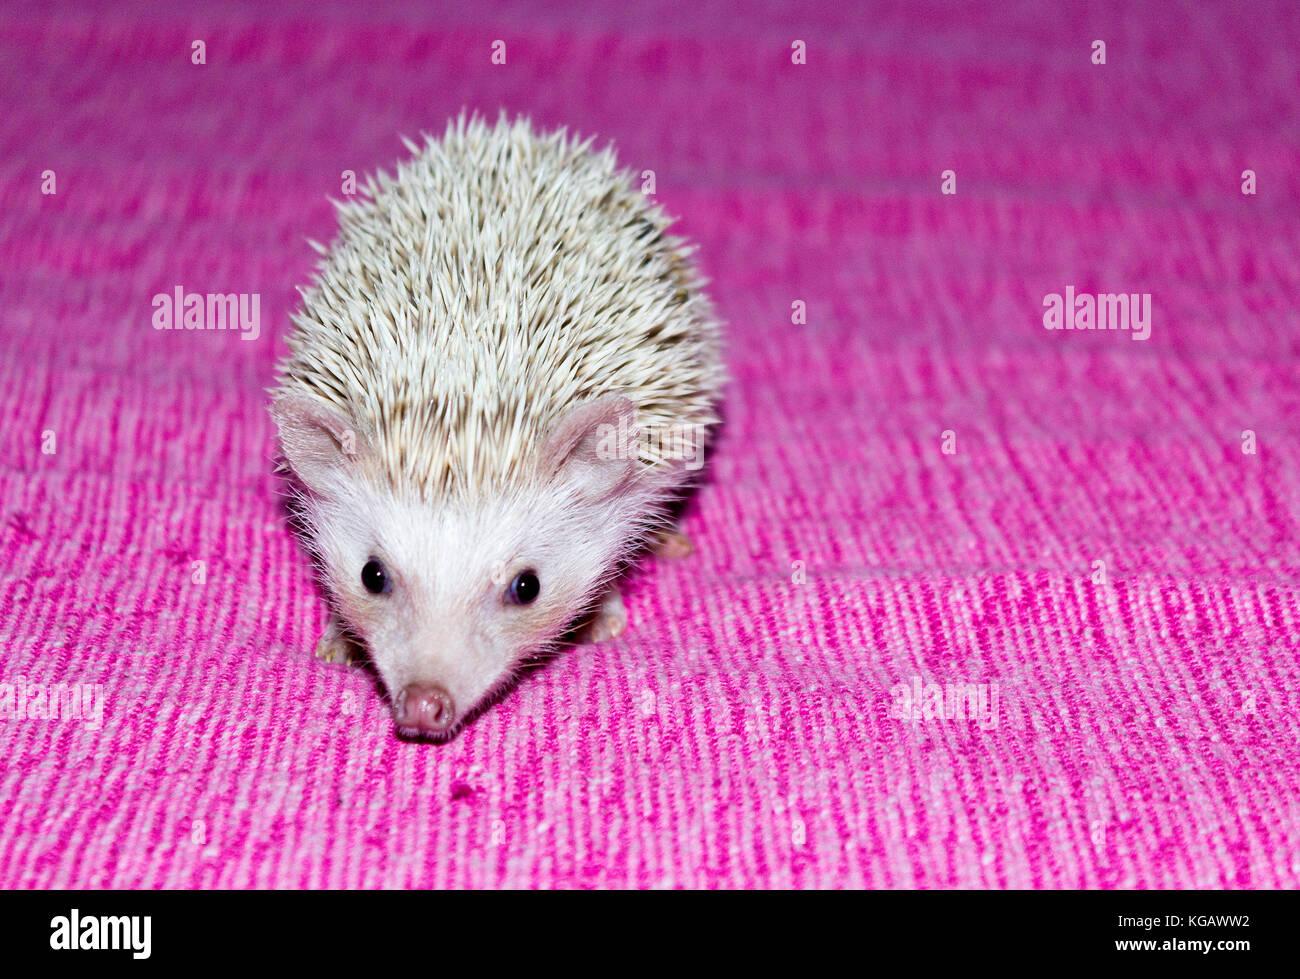 Pet- Four-toed hedgehog (Atelerix albiventris) or African pygmy hedgehog - Stock Image